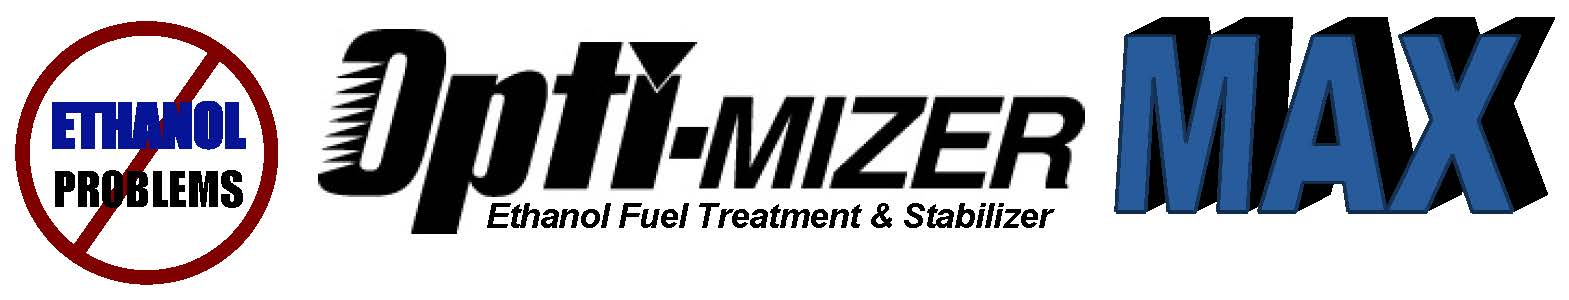 Opti-Mizer MAX Logo